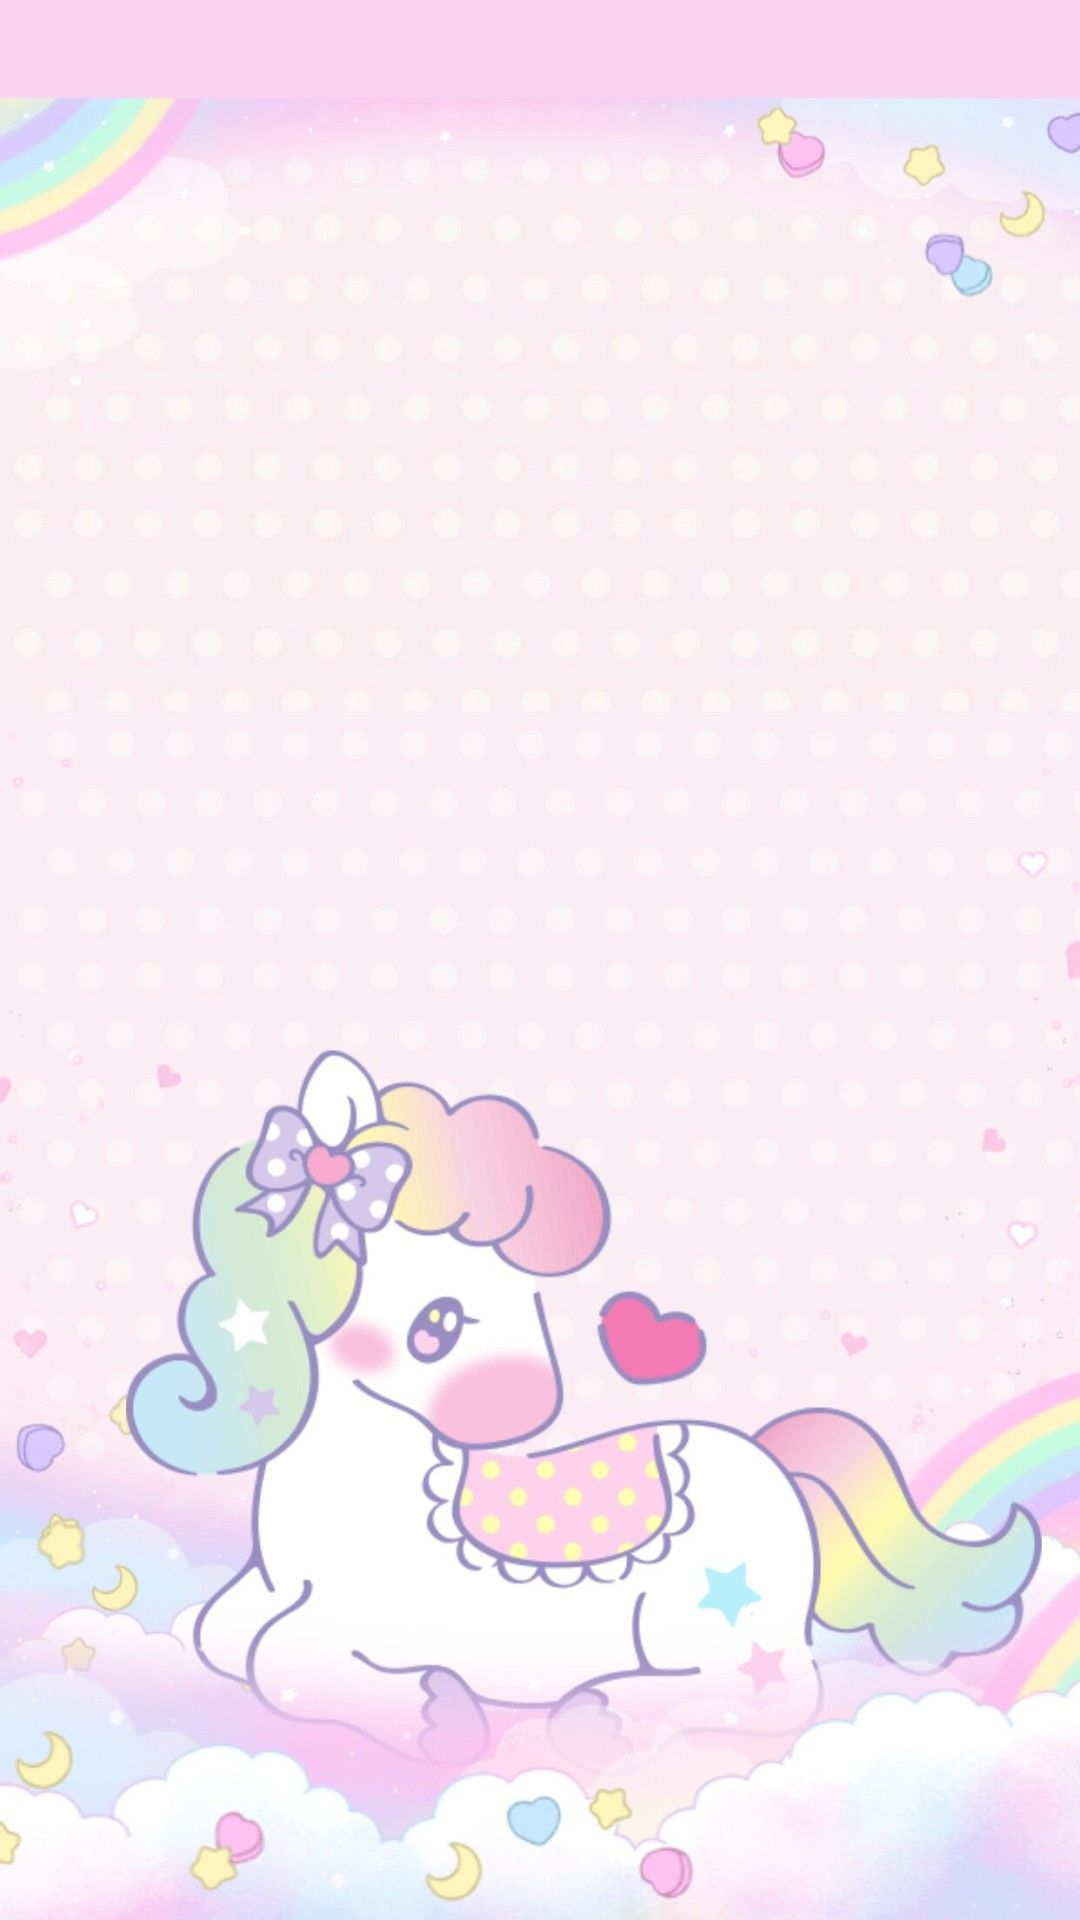 Cute pink unicorn wallpaper images